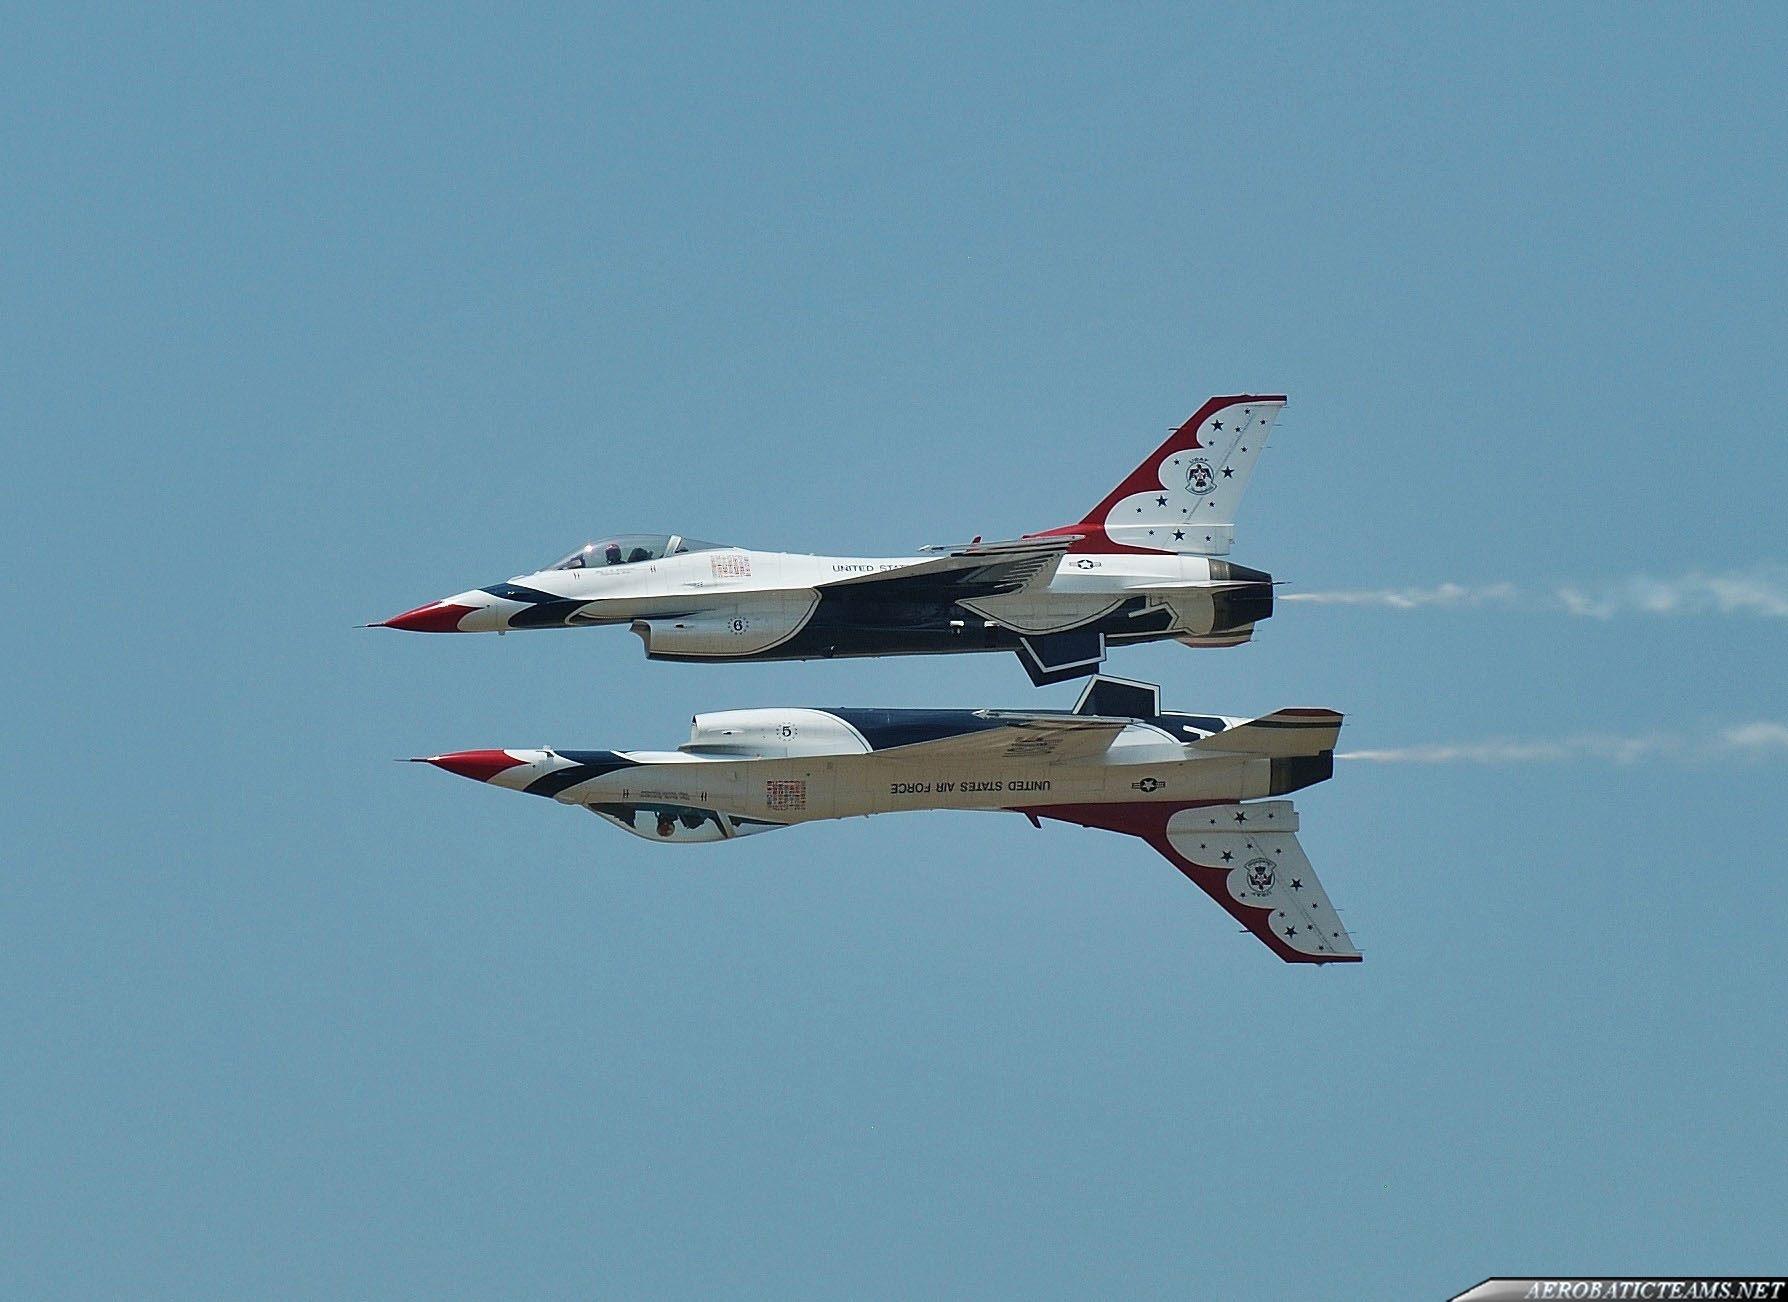 Thunderbirds practice flight, June 24